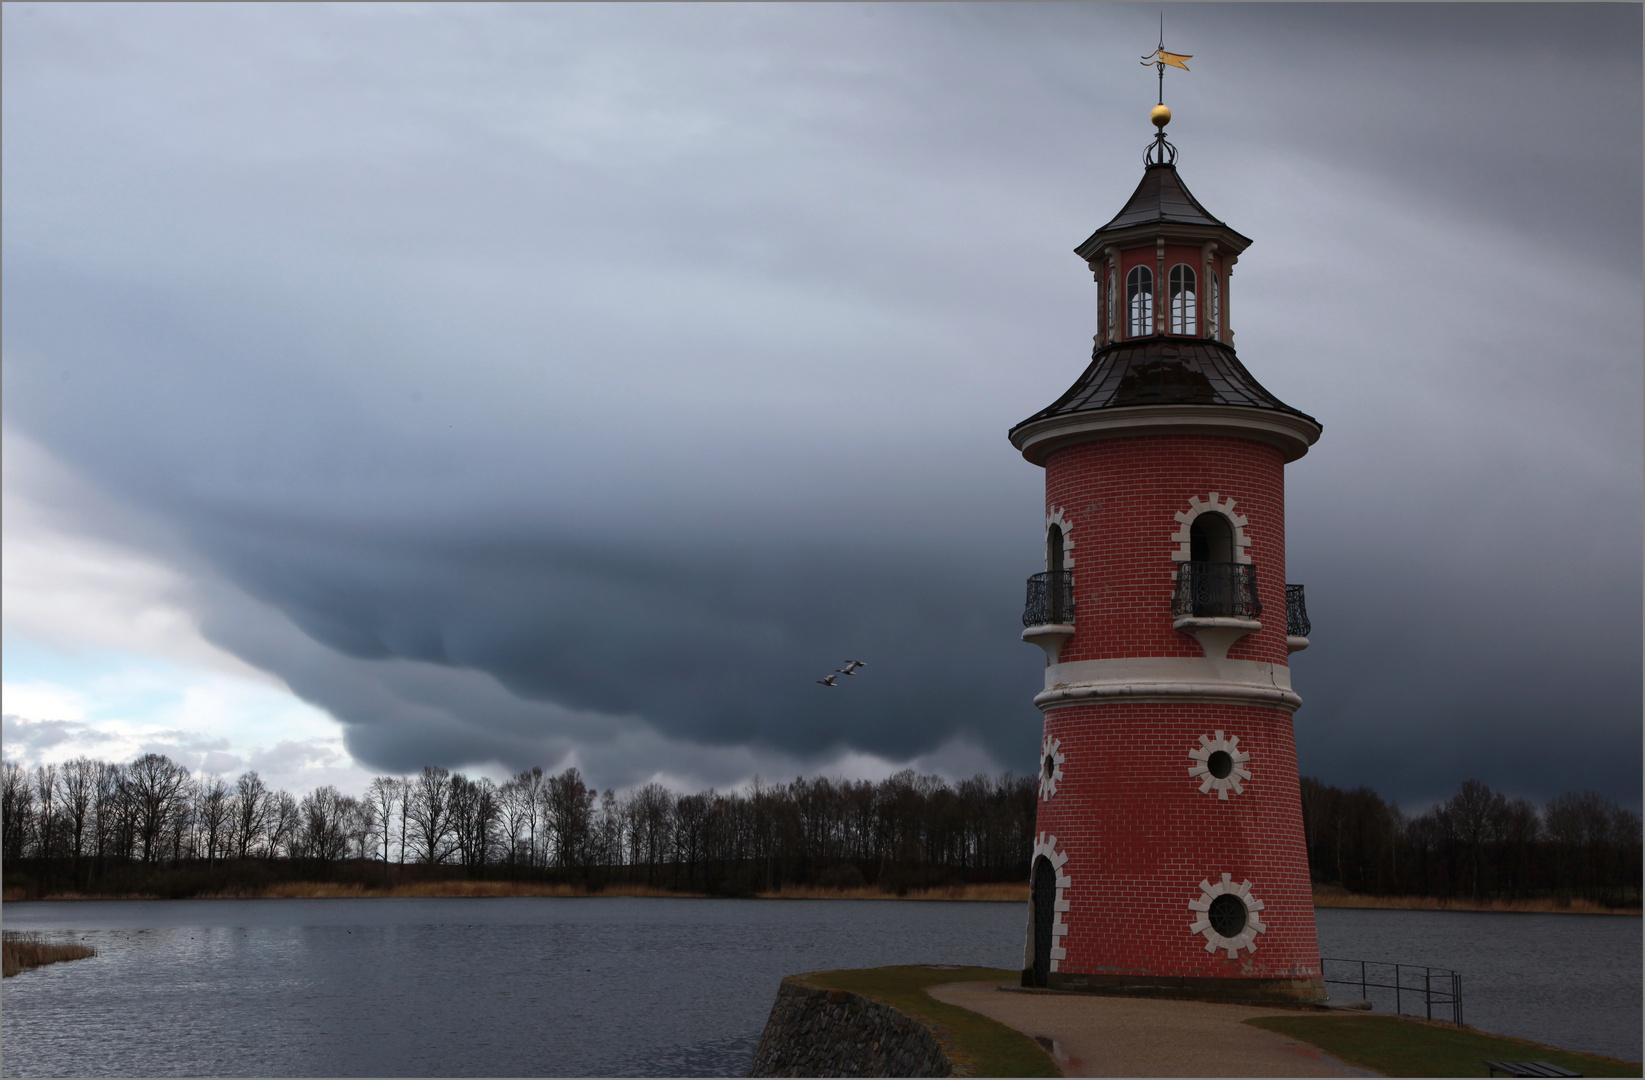 more photos 365d3 e167e Leuchtturm in Moritzburg bei Dresden 2 Foto & Bild ...